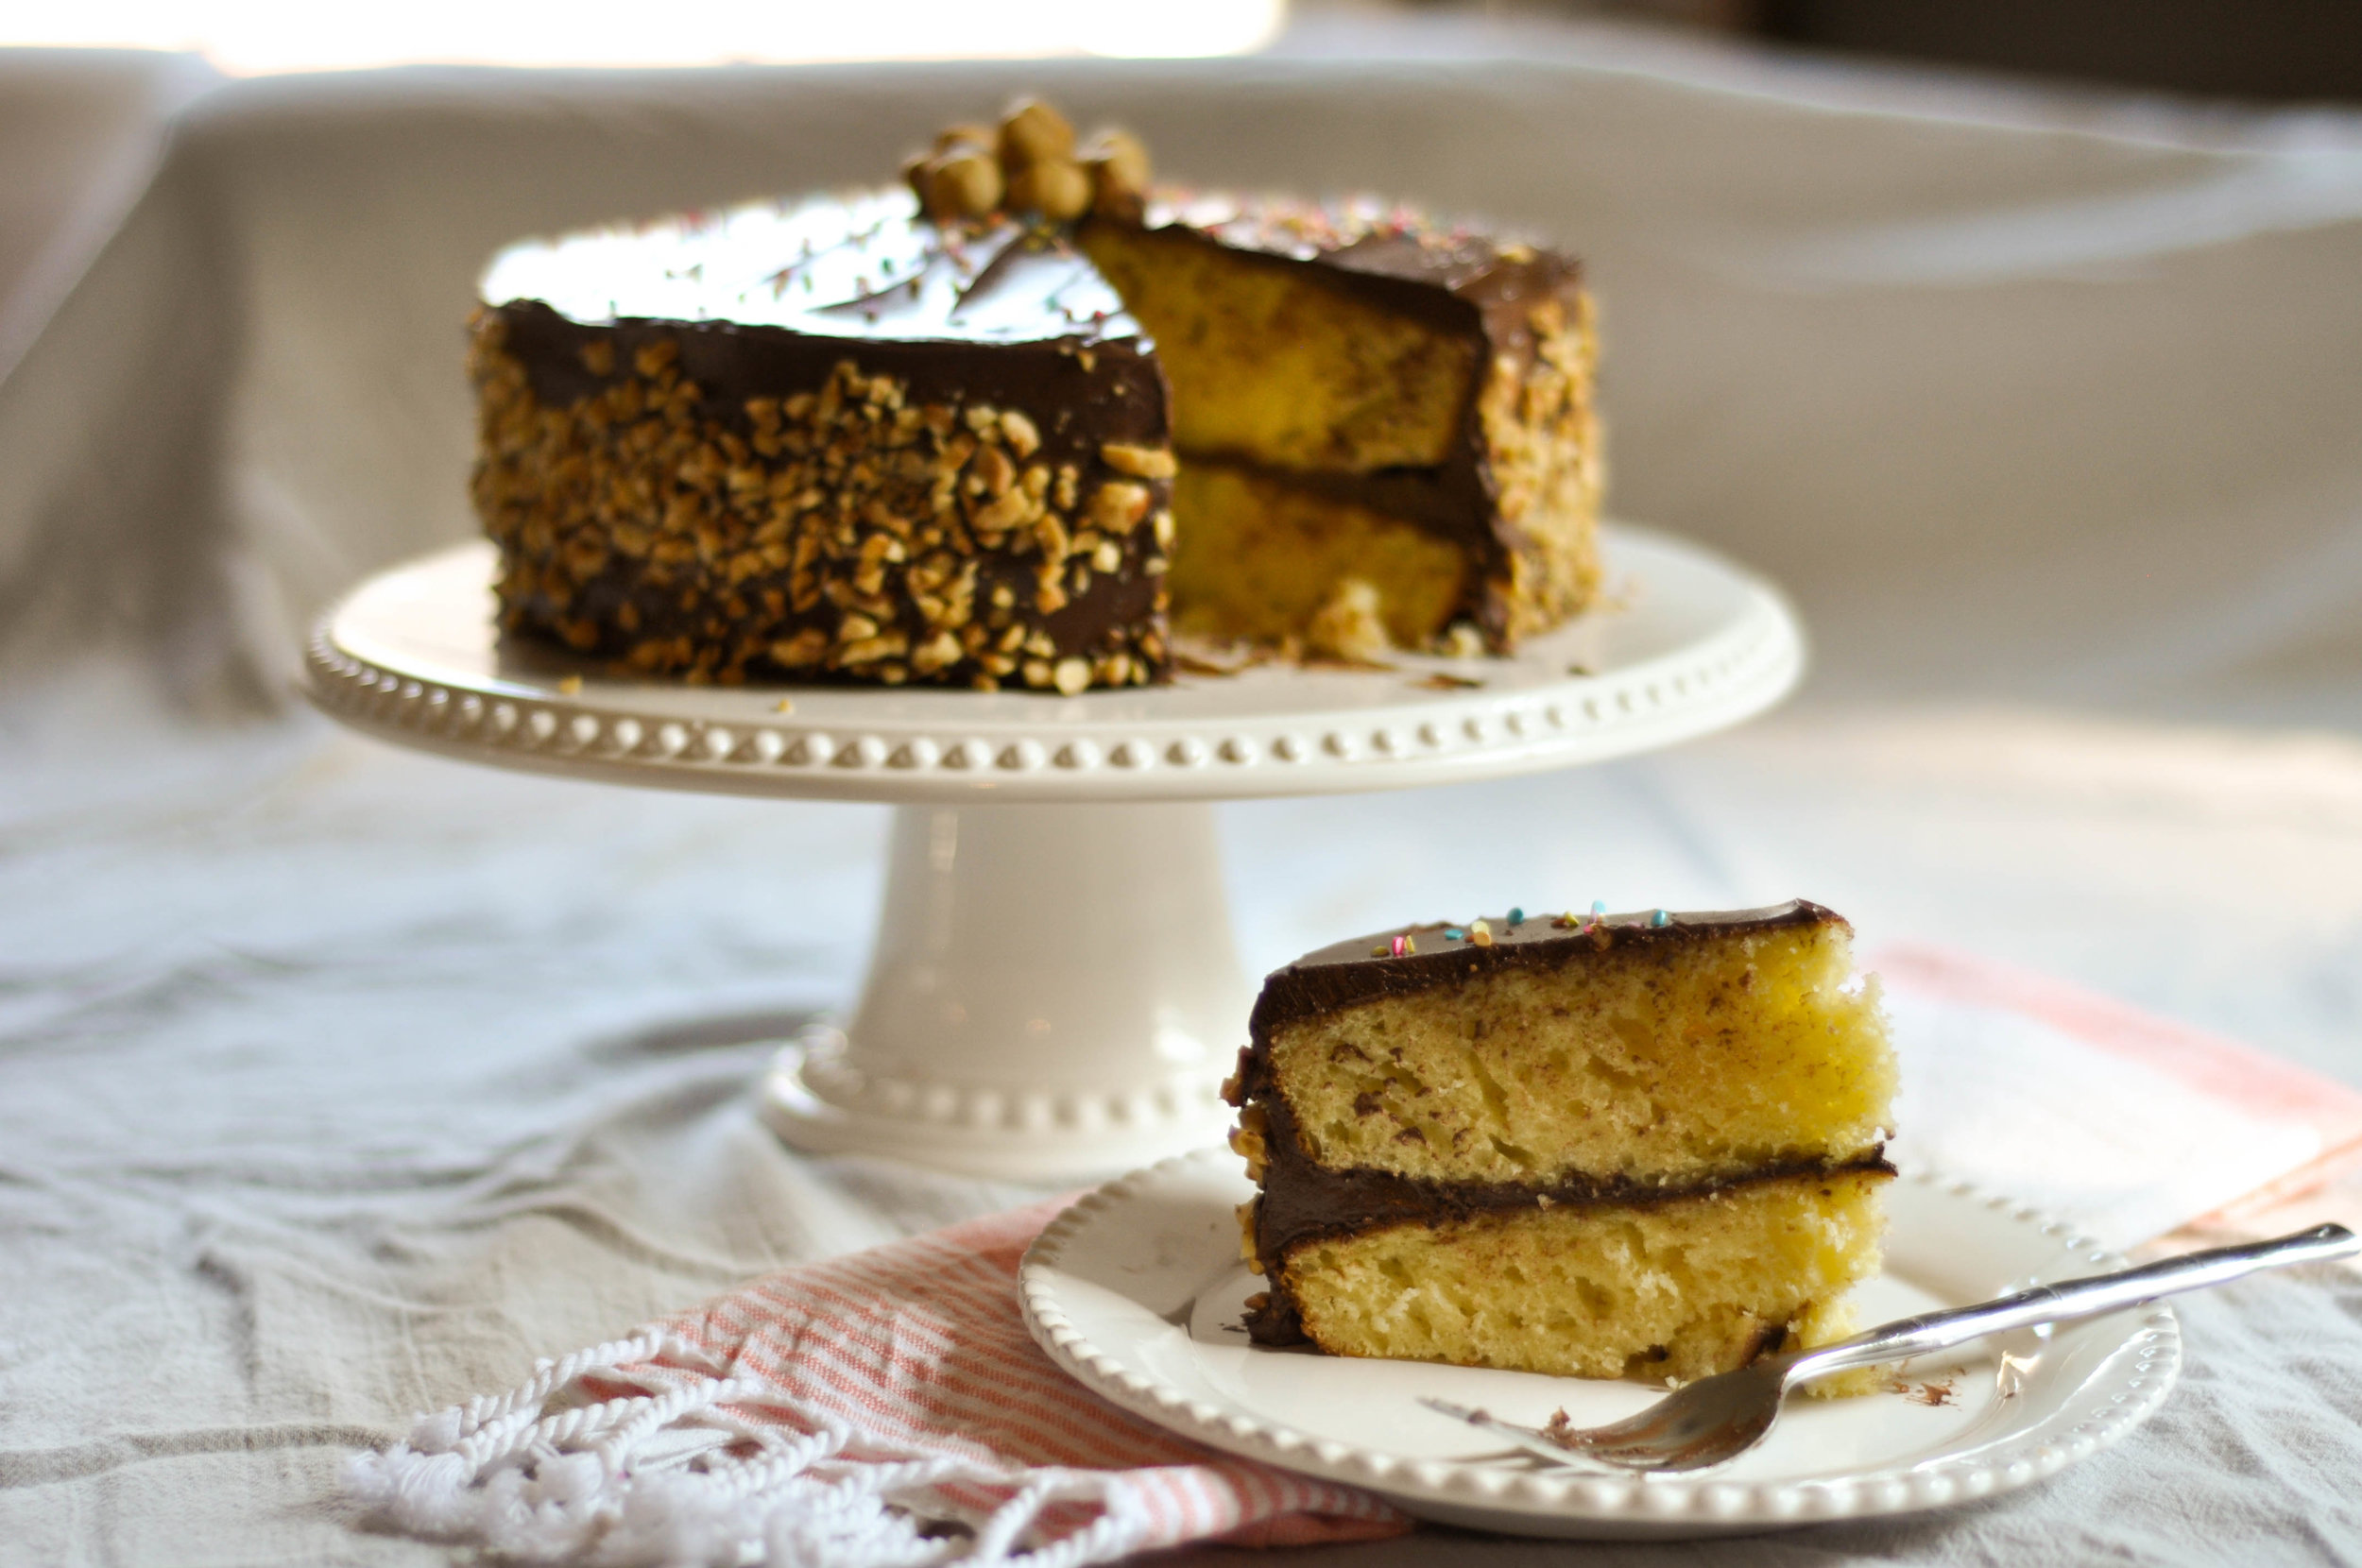 Vanilla Birthday Cake With Nutella Frosting_ Sliced CU.jpg